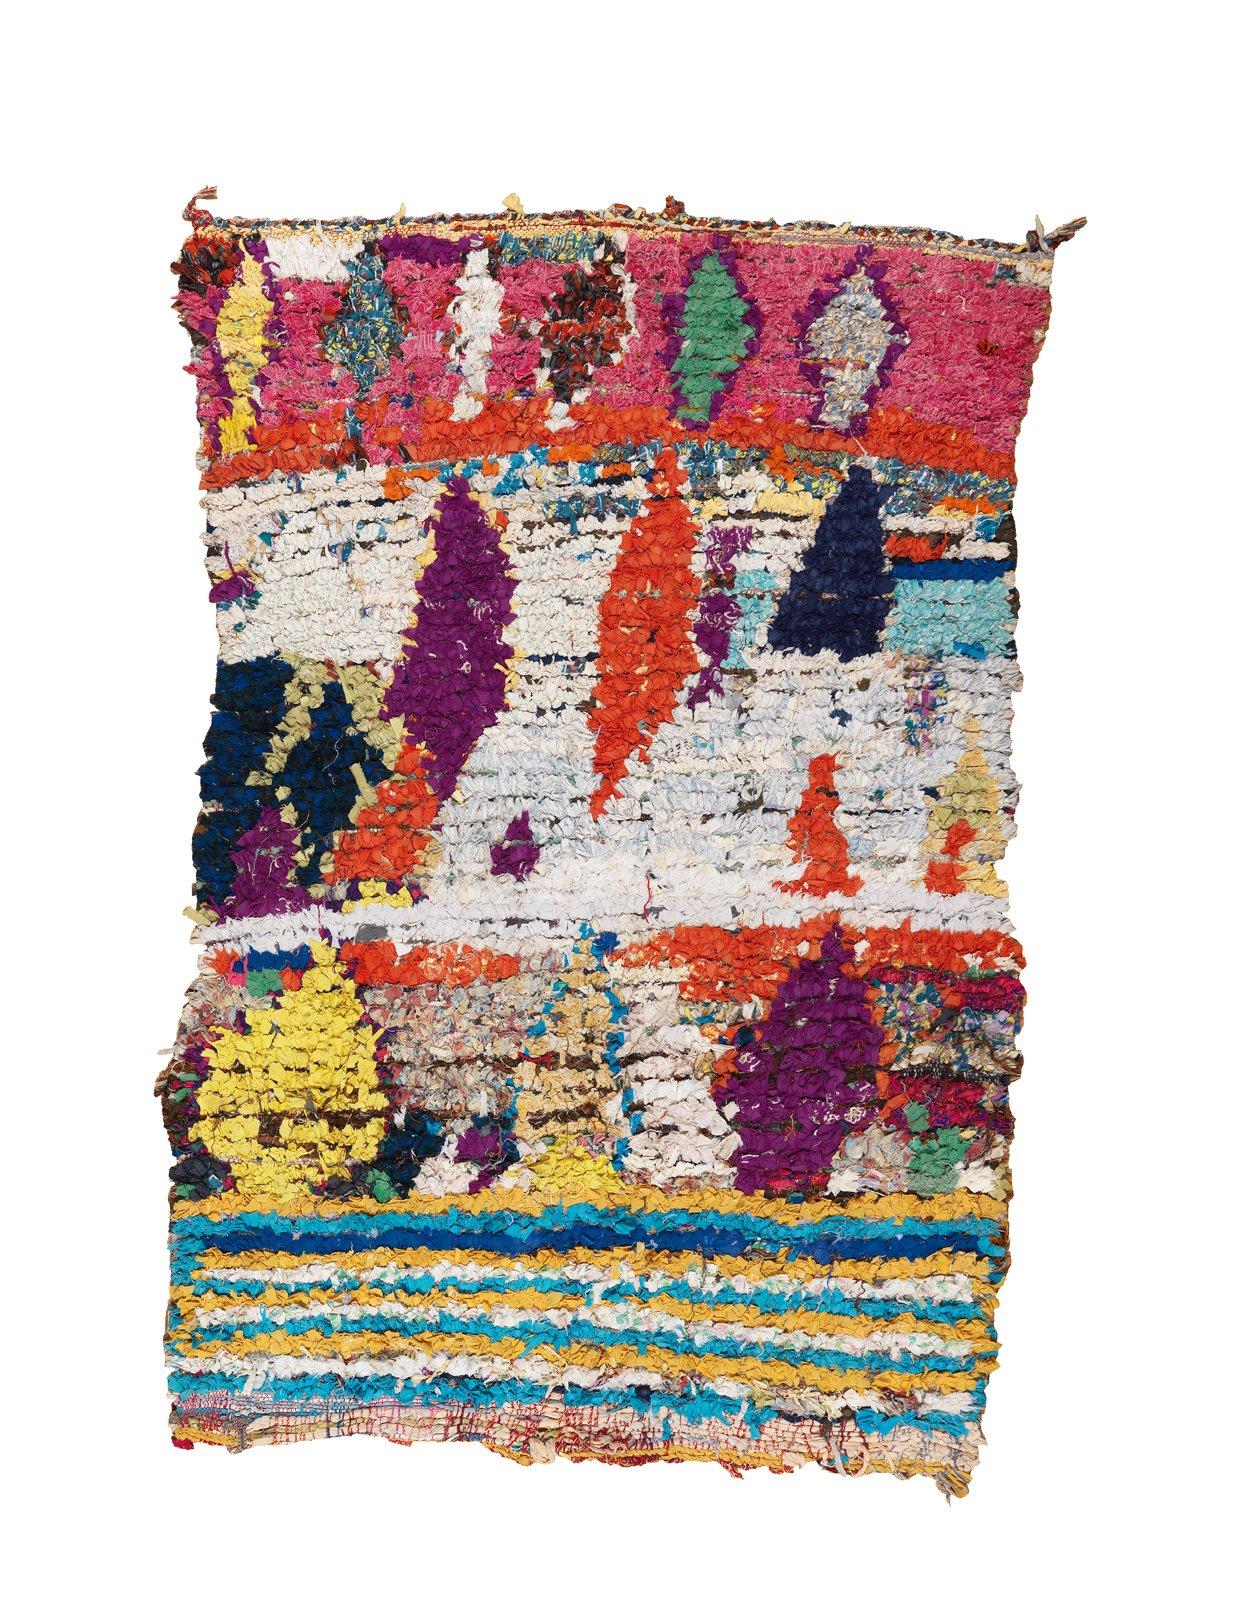 "A 4'6"" by 7' collage of stripes and diamonds, motifs found in traditional Moroccan carpets.  Search ""사설사다리총판구인 【텔레그램XZ114】 걱정 없는 정산에 확실한 보안 유지 토토본사 직원 총판구인 7"" from Berber Ragtime"